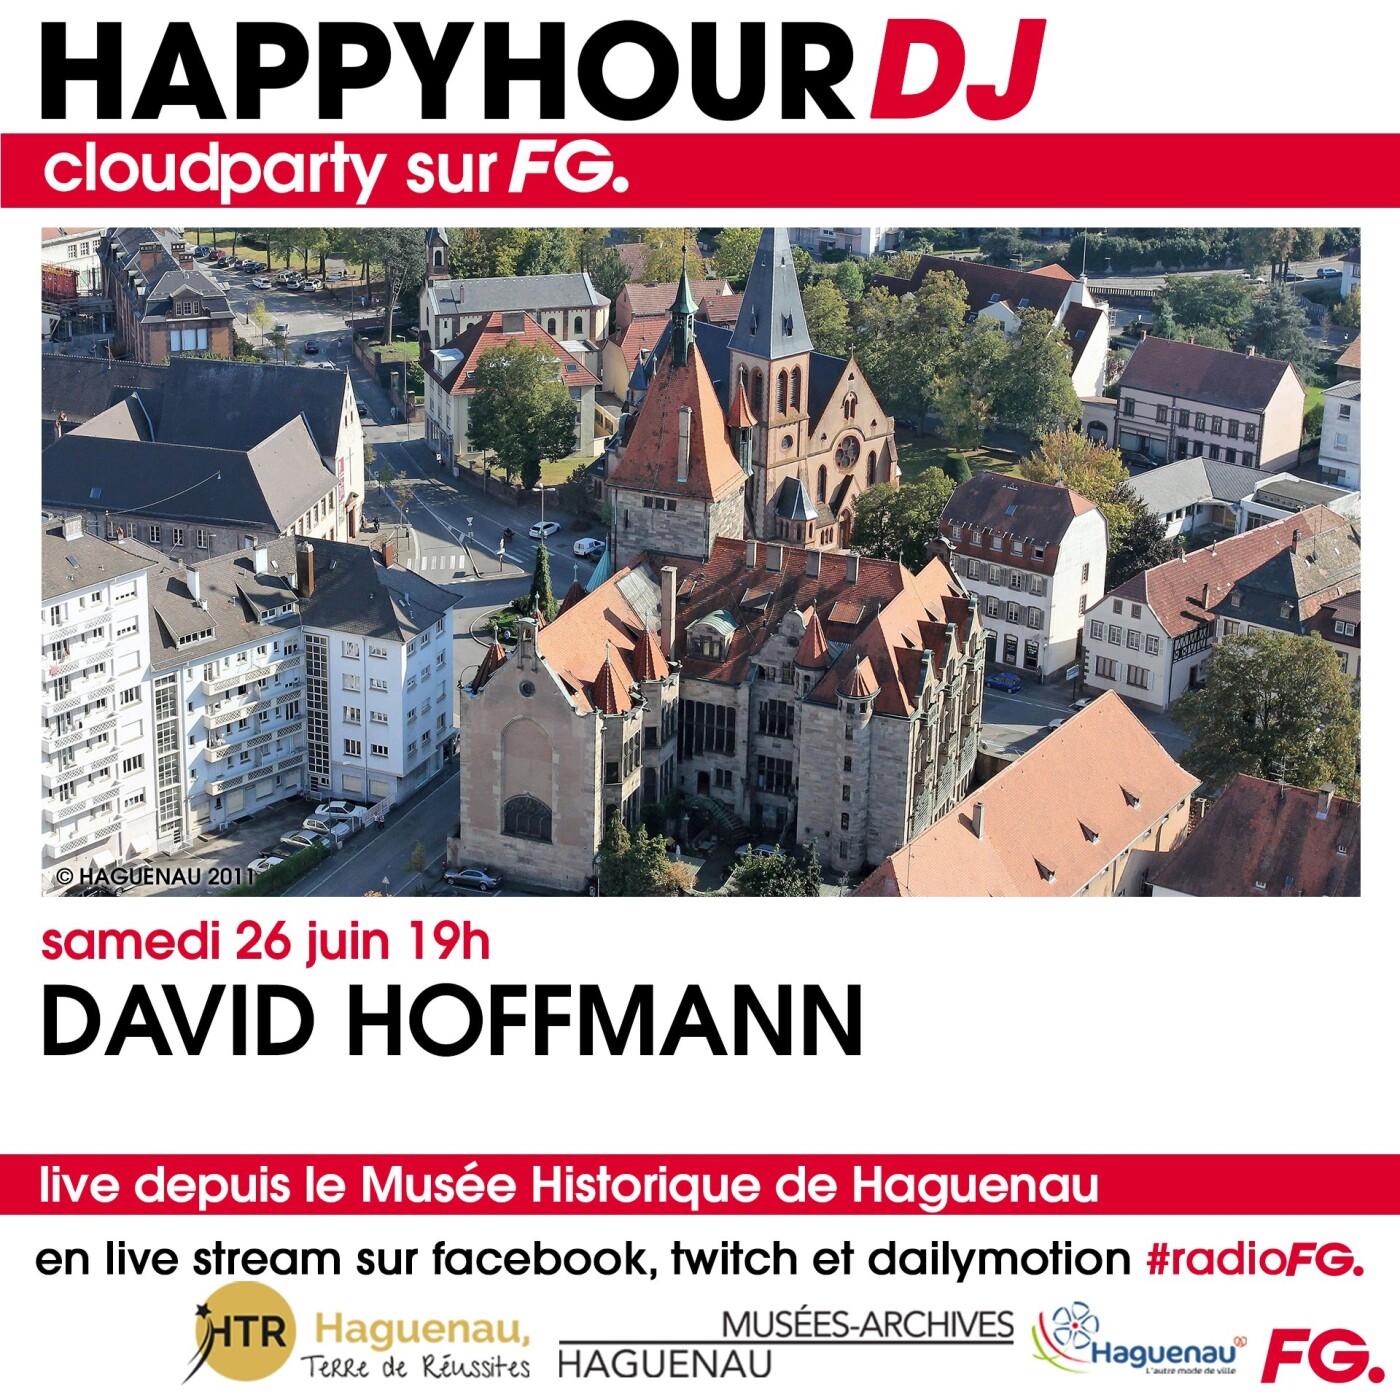 HAPPY HOUR DJ : DAVID HOFFMANN